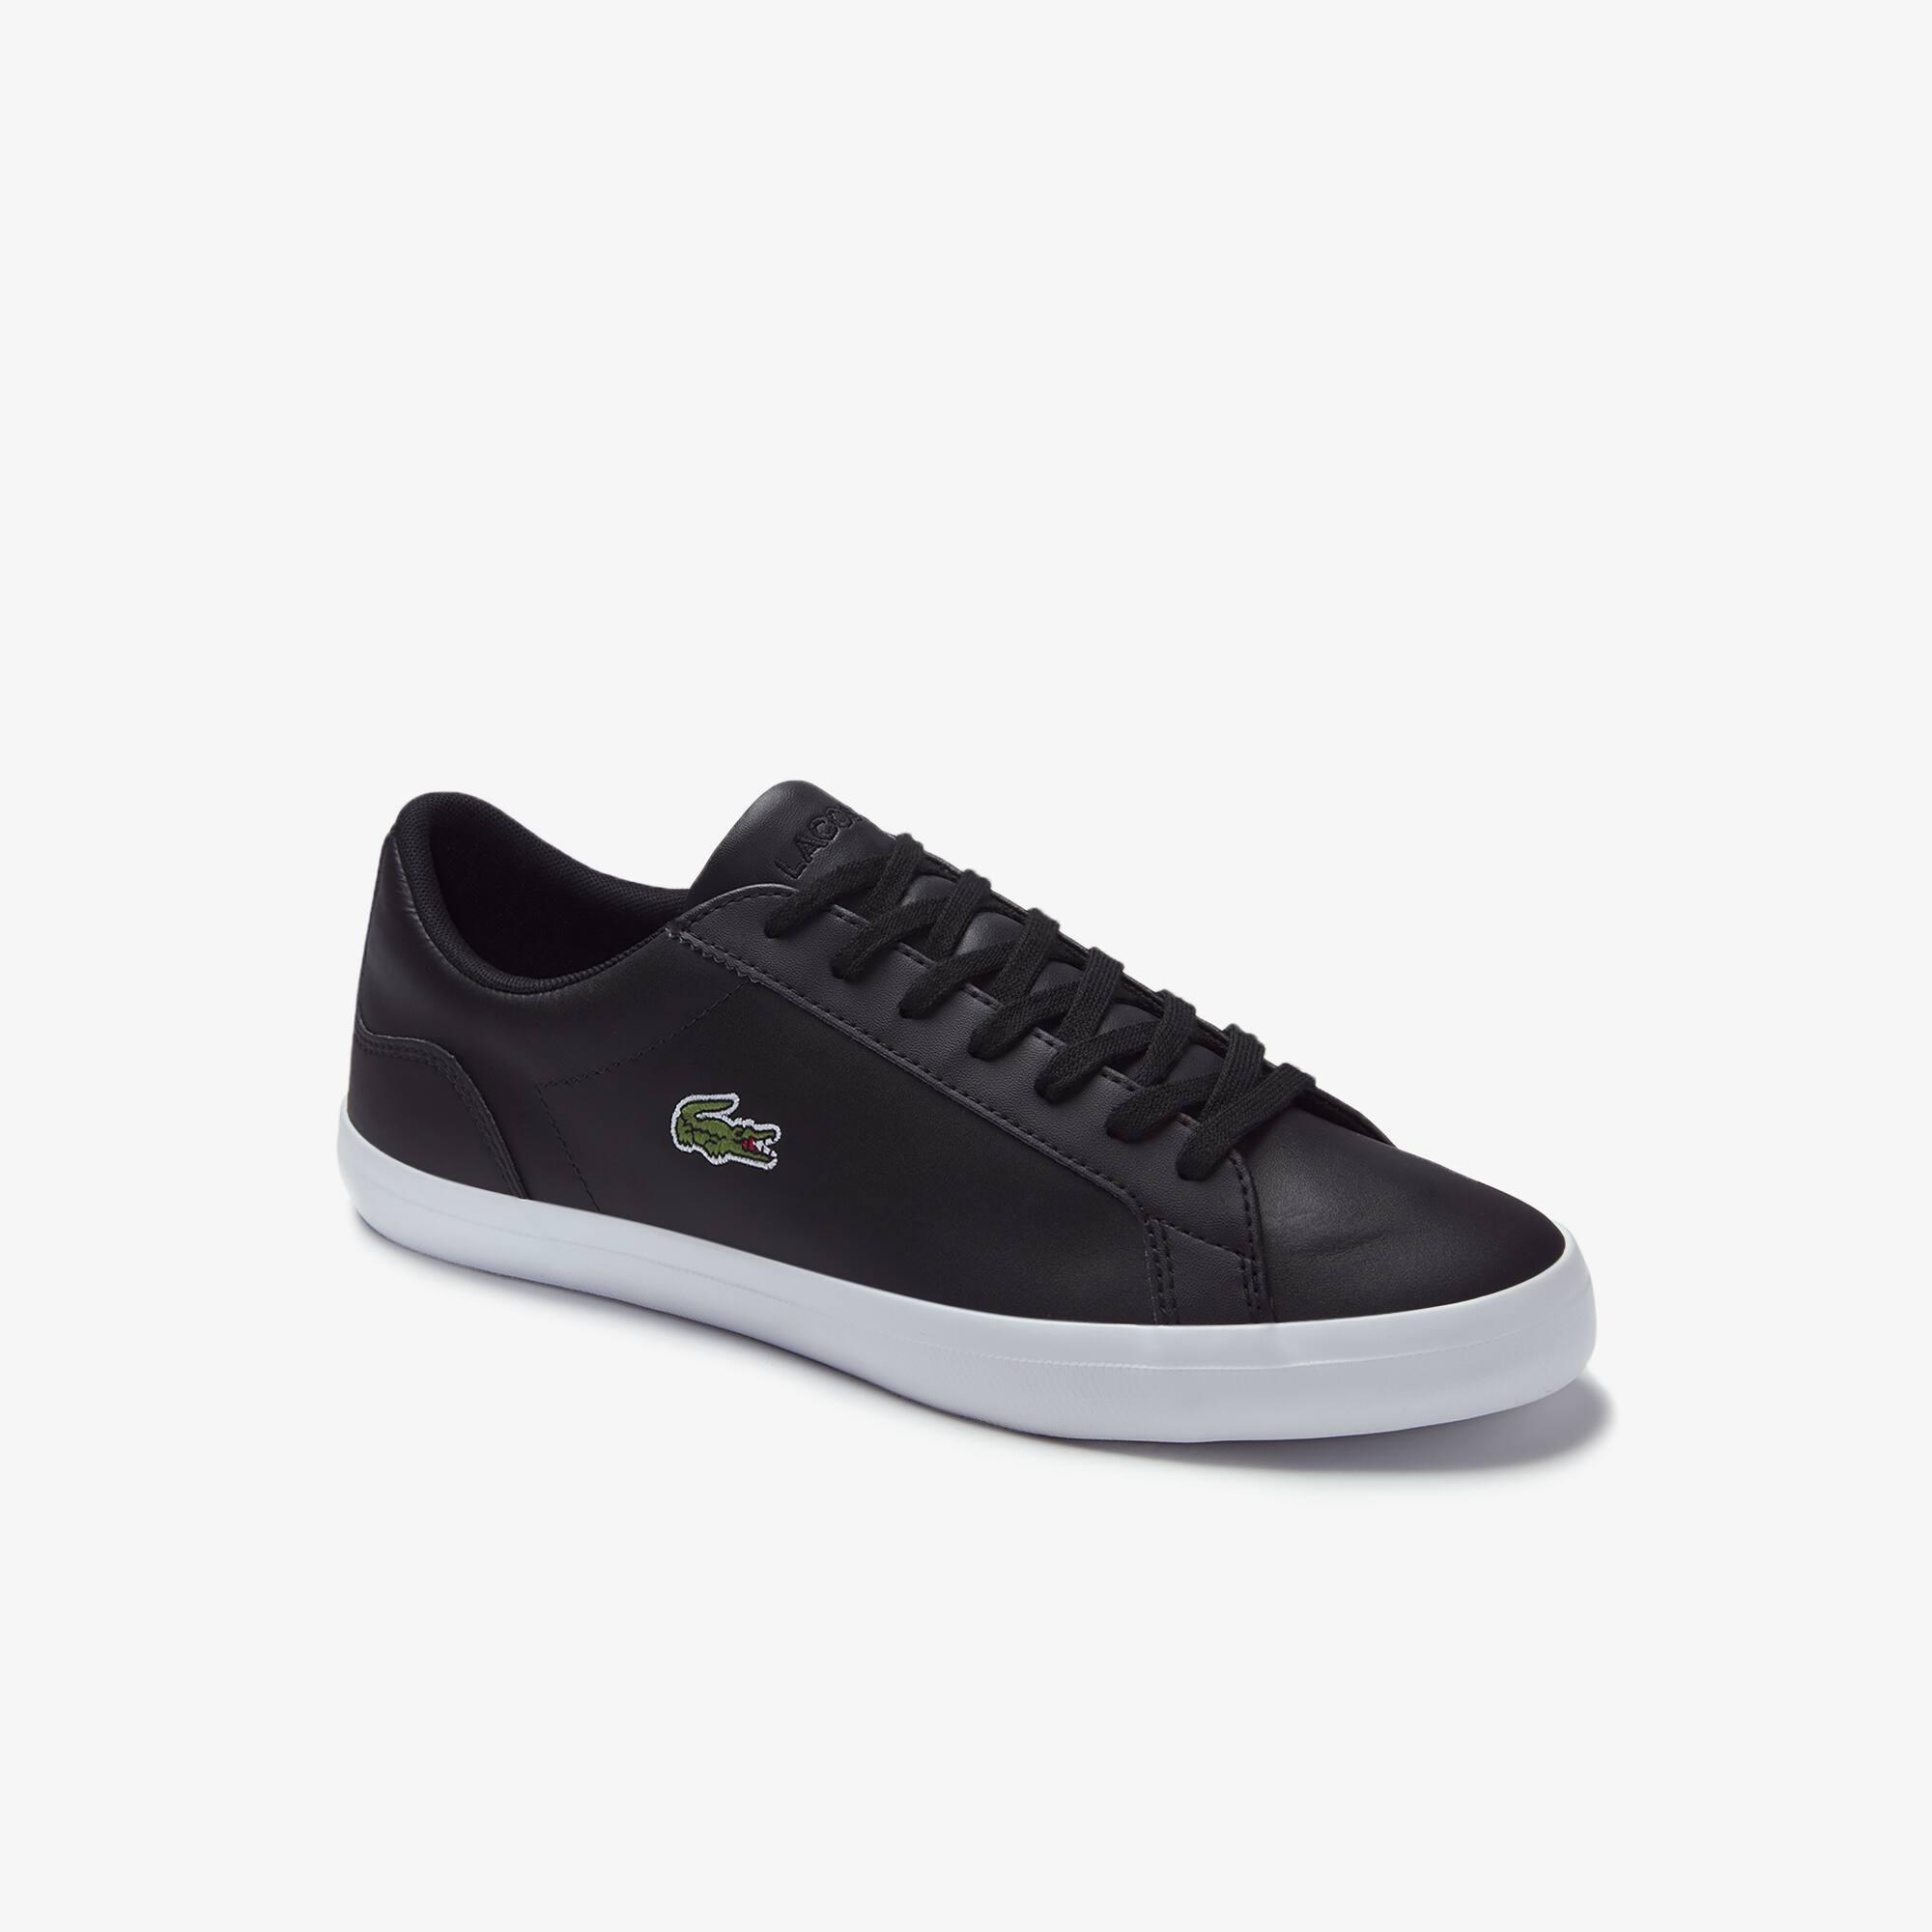 Herren-Sneakers LEROND aus einfarbigem Leder